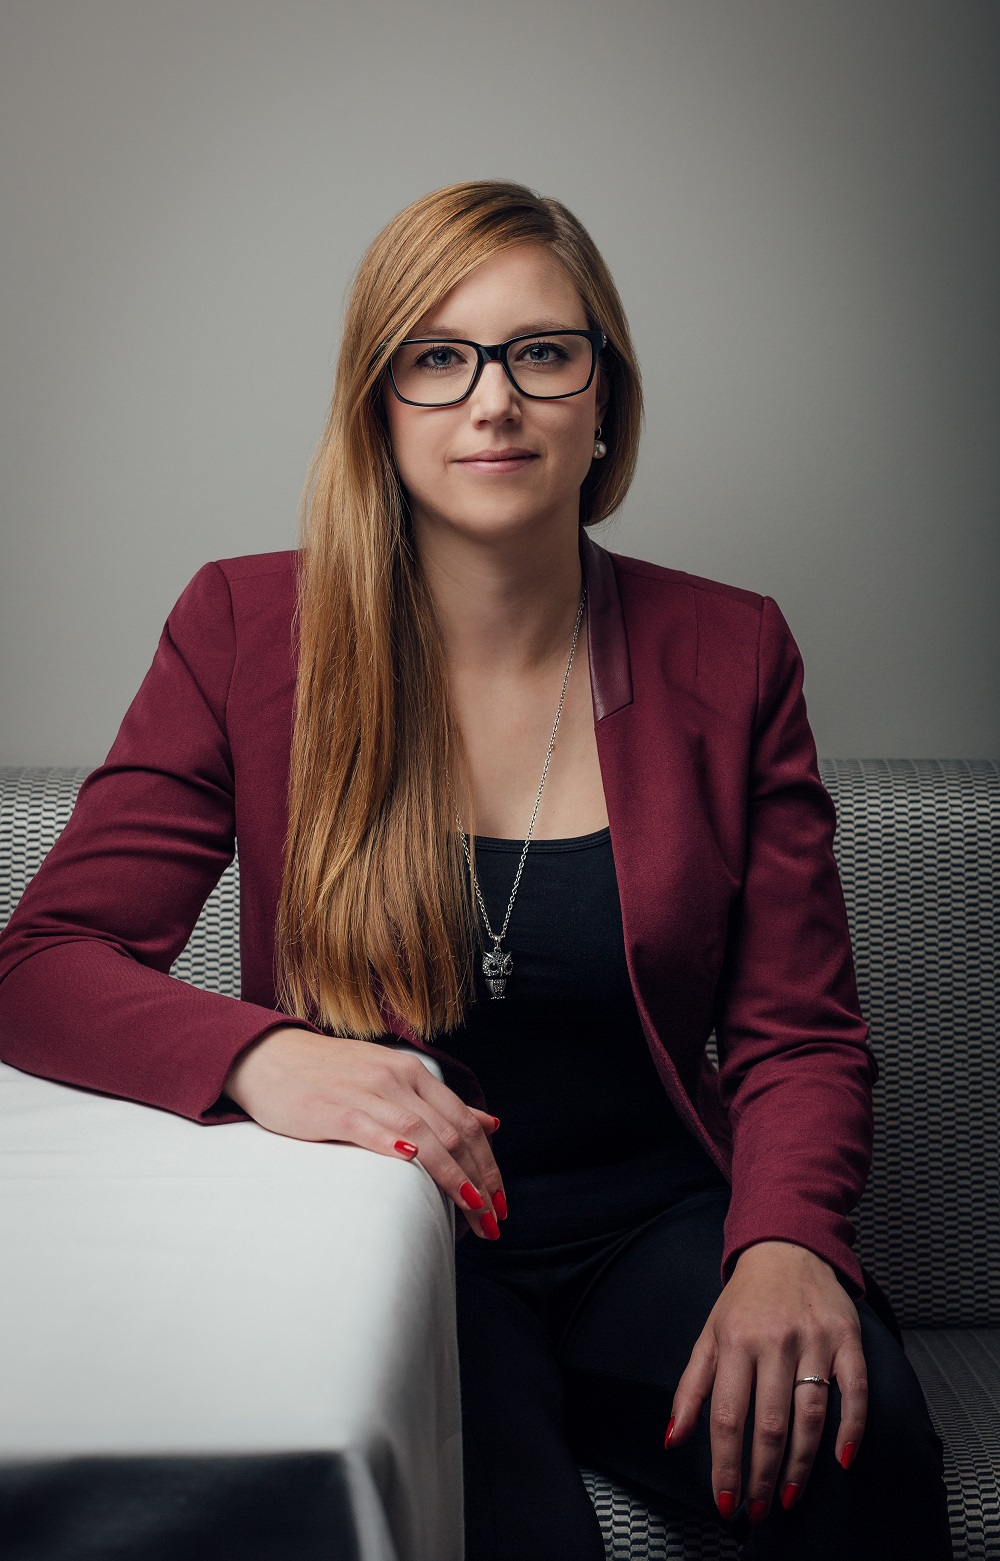 Eventmanager Sarah Schreiber